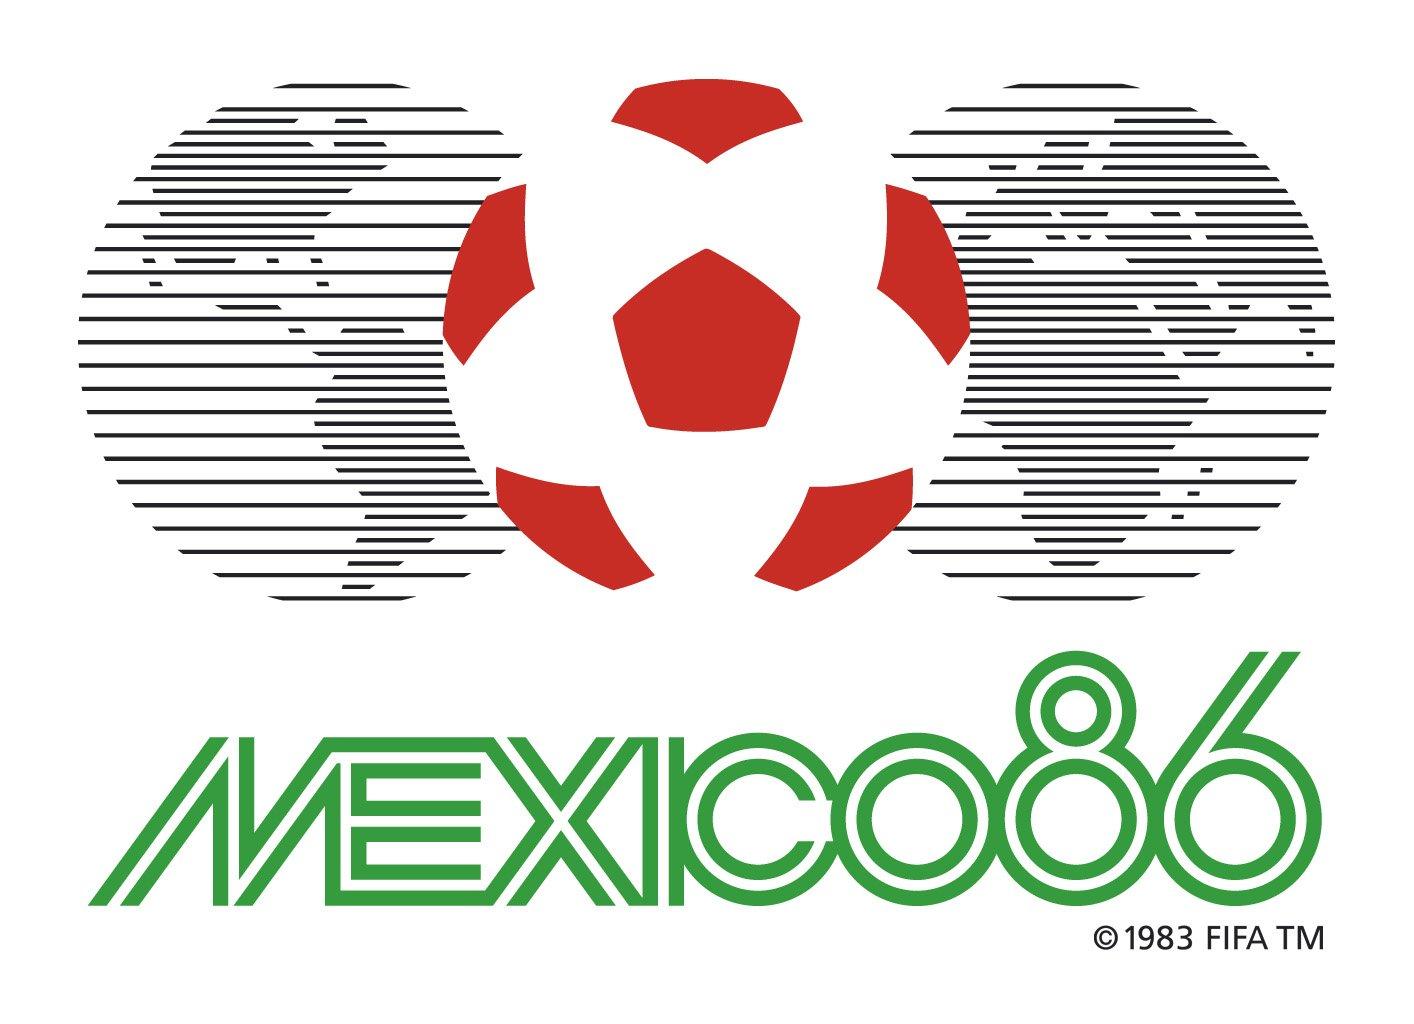 Gana Logo México 1986. Foto: Twitter